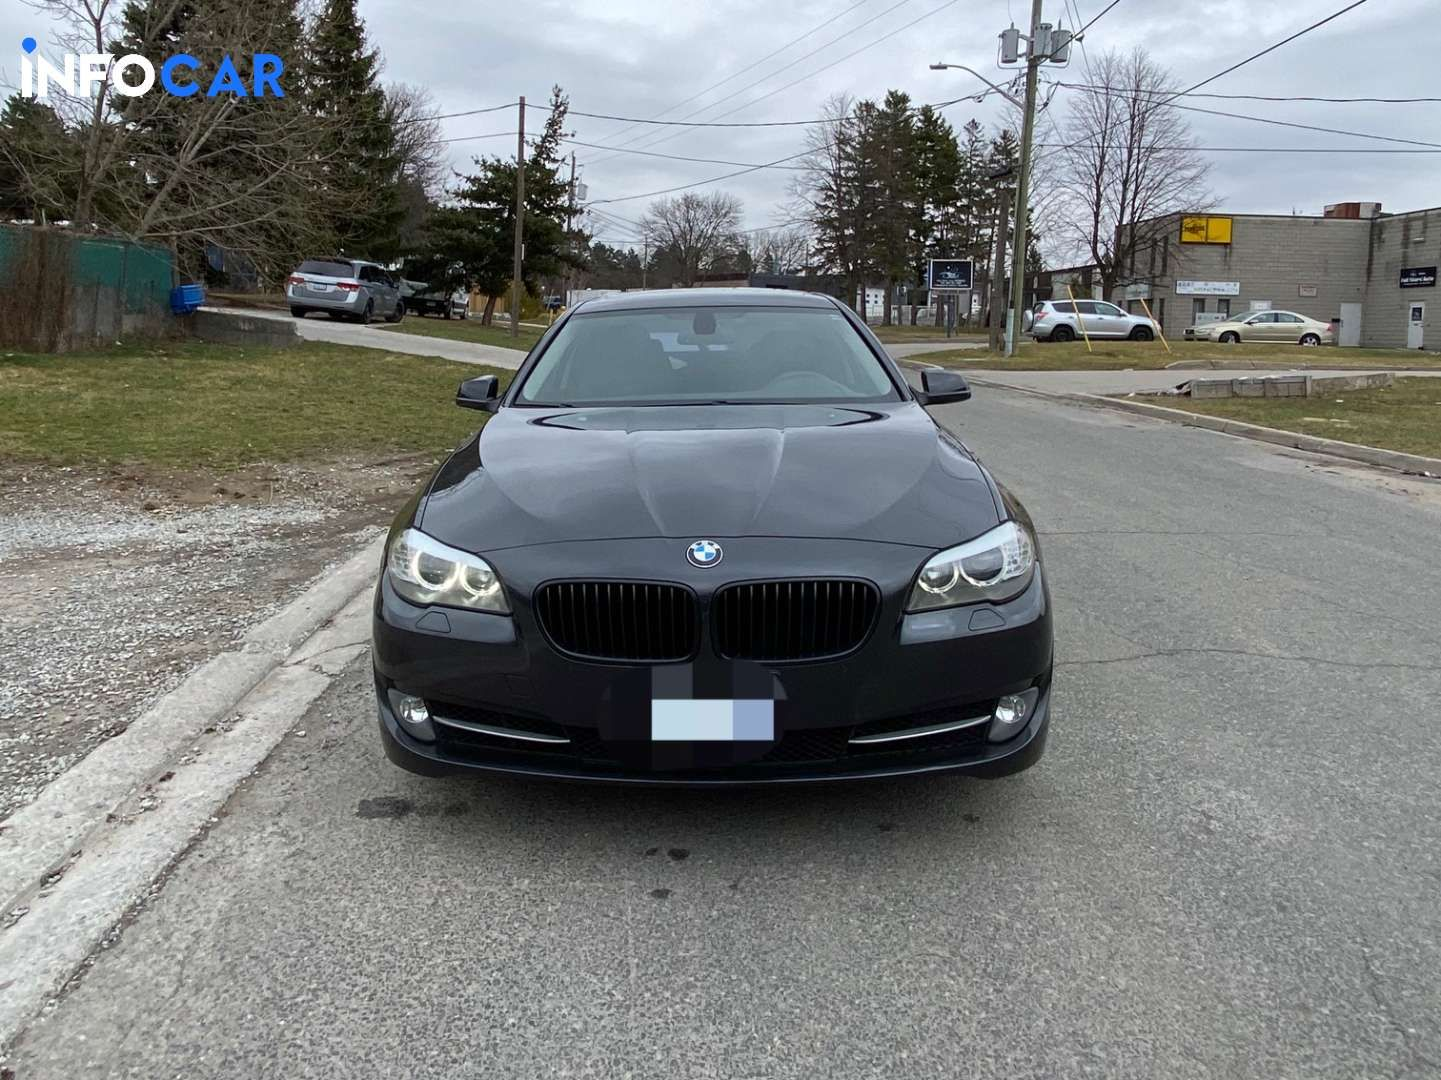 2011 BMW 5-Series 535xi - INFOCAR - Toronto's Most Comprehensive New and Used Auto Trading Platform